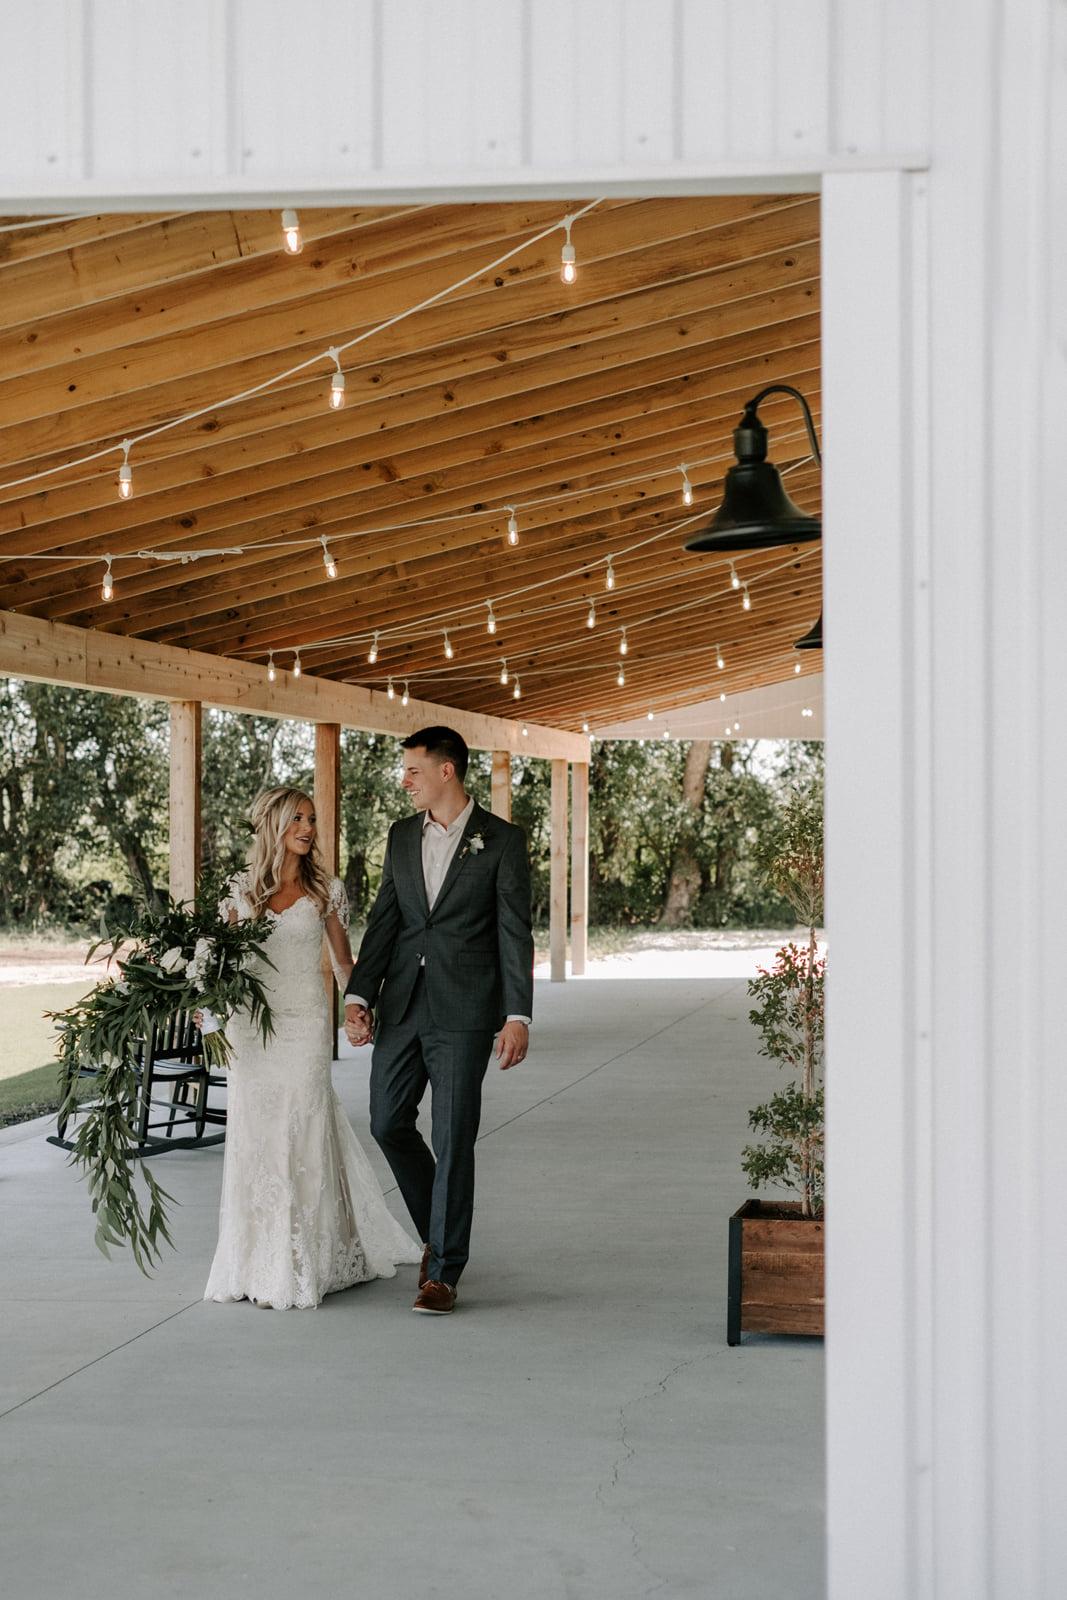 The-Barn-at-Grace-Hill-Wichita-Wedding-Venue-215.jpg